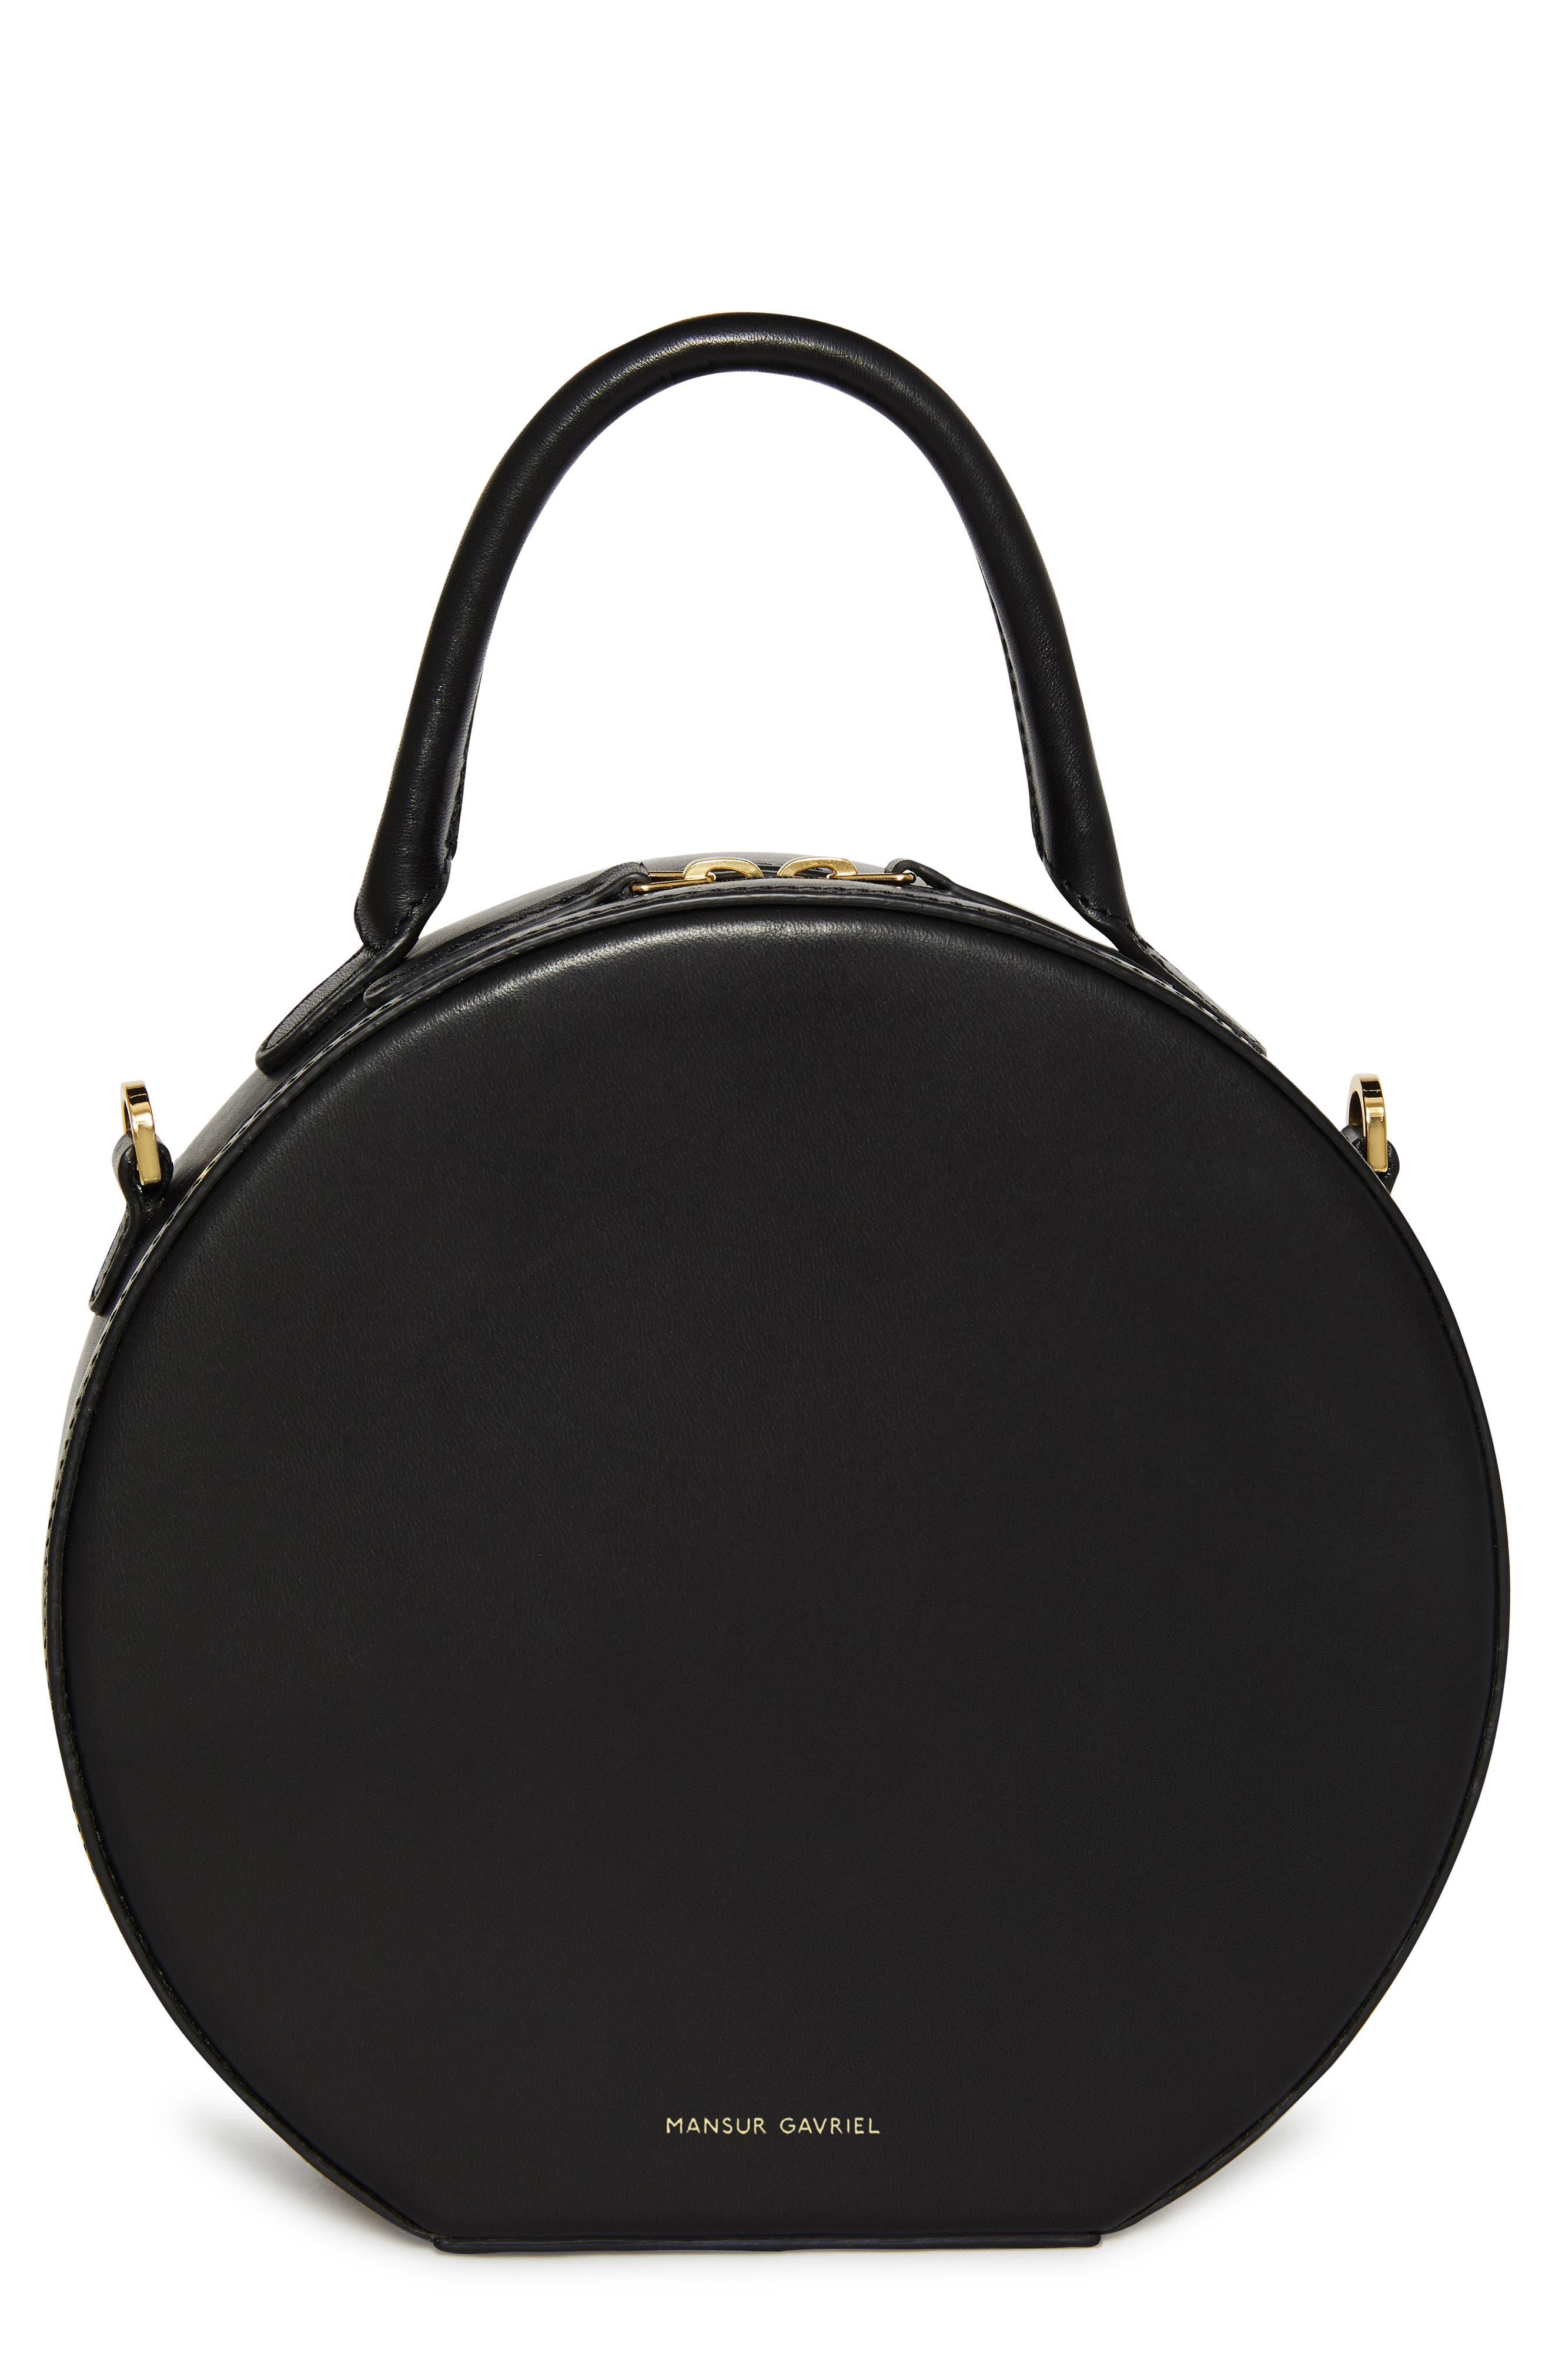 MANSUR GAVRIEL Leather Circle Crossbody Bag, Main, color, BLACK